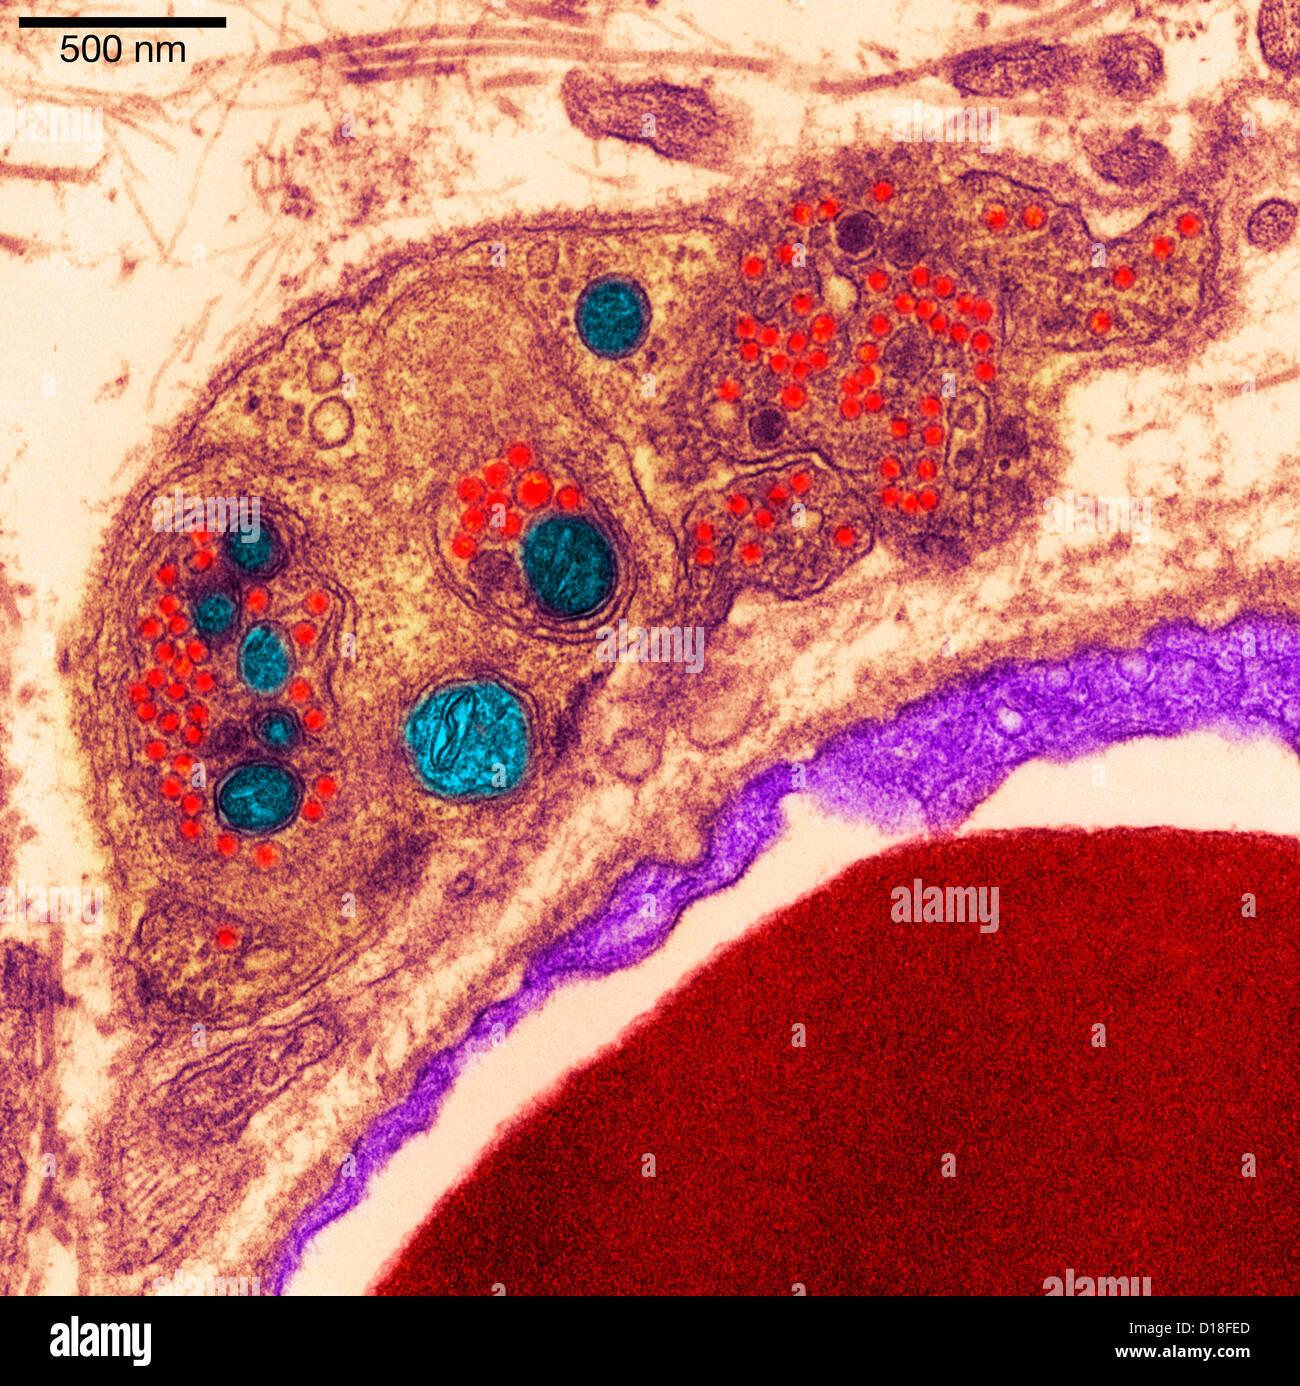 Transmission Electron micrograph pancreas Stock Photo